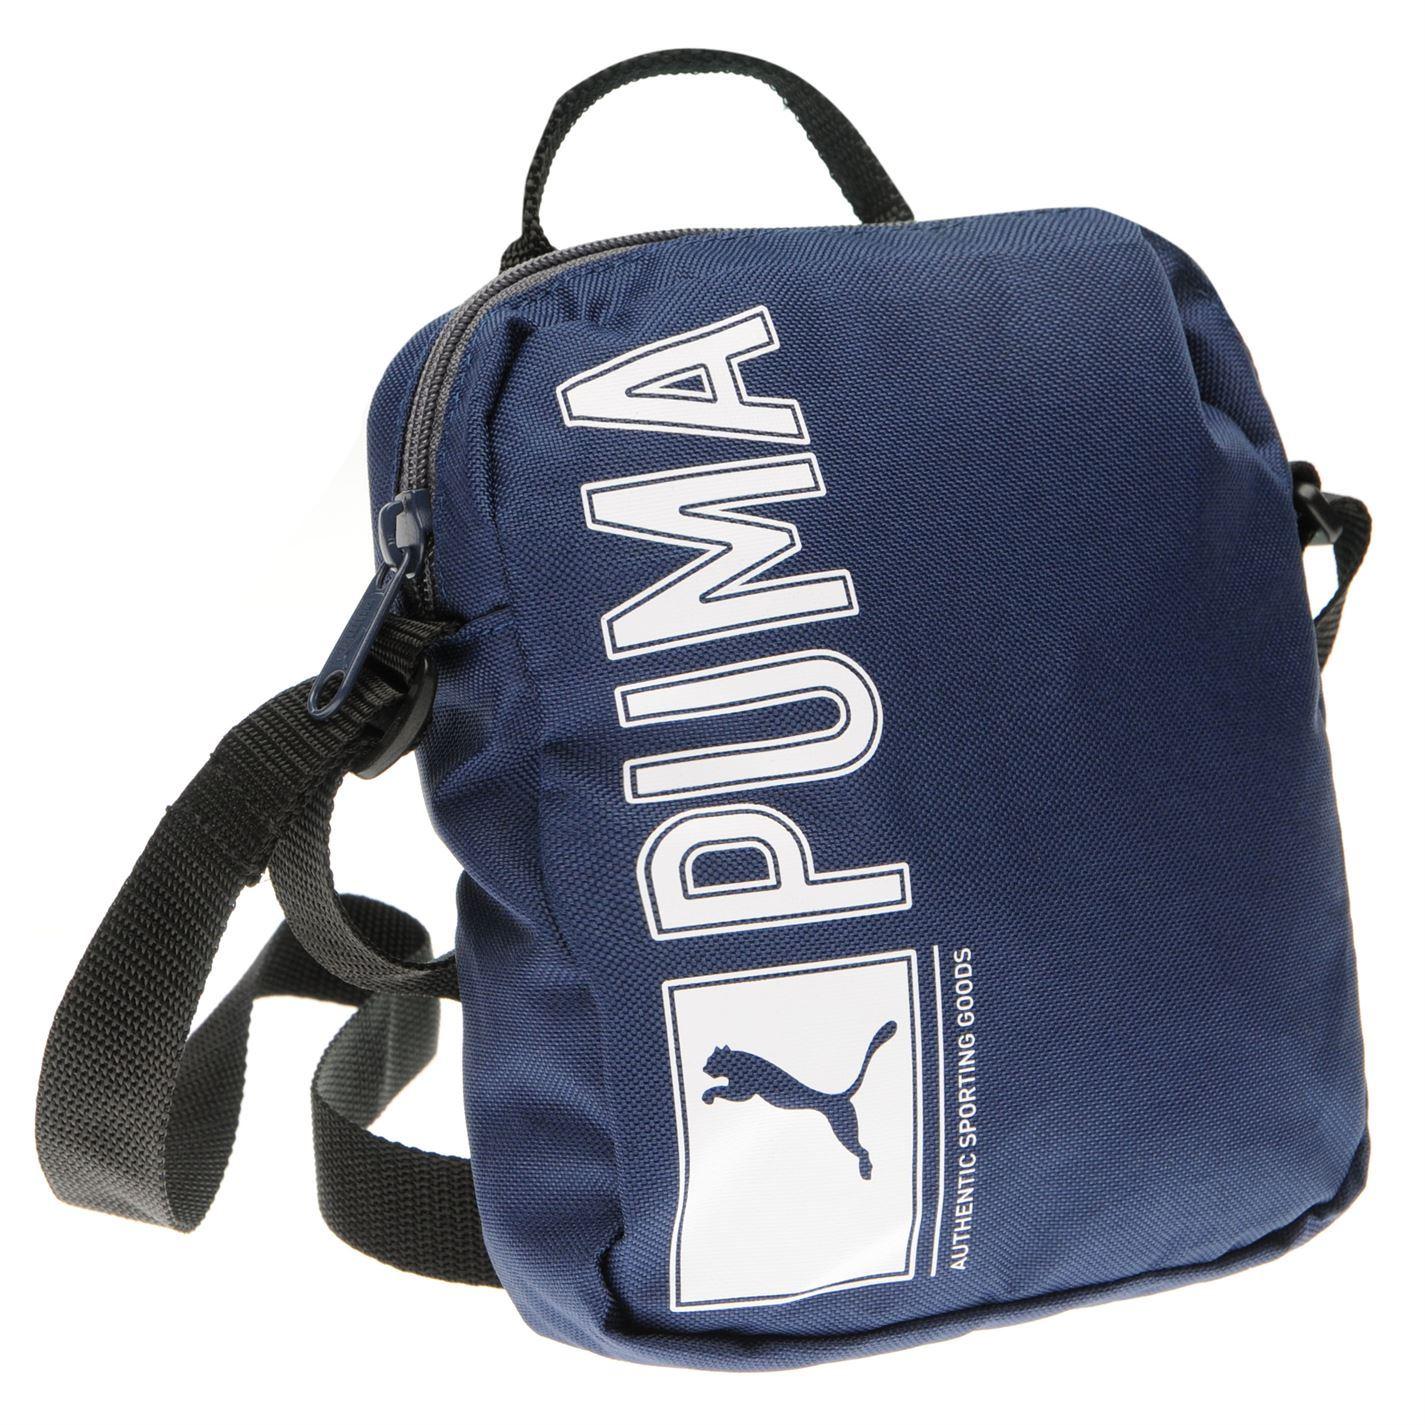 685b269006 ... Puma Pioneer Portable Organiser Small Items Bag Navy Shoulder bag  Carryall